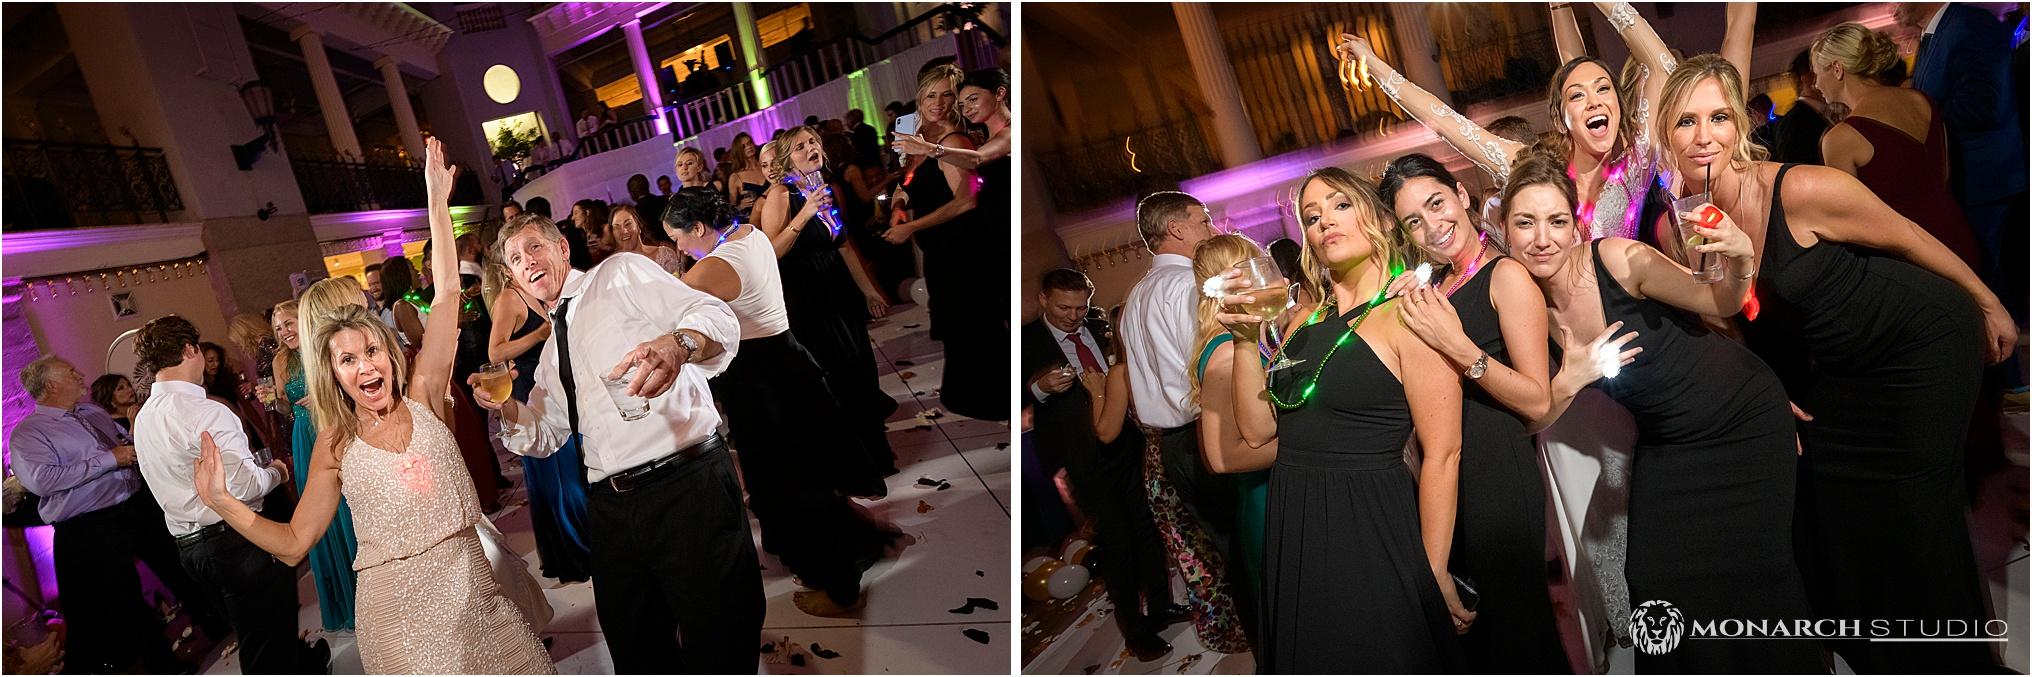 st-augustine-high-end-wedding-photographers-162.jpg